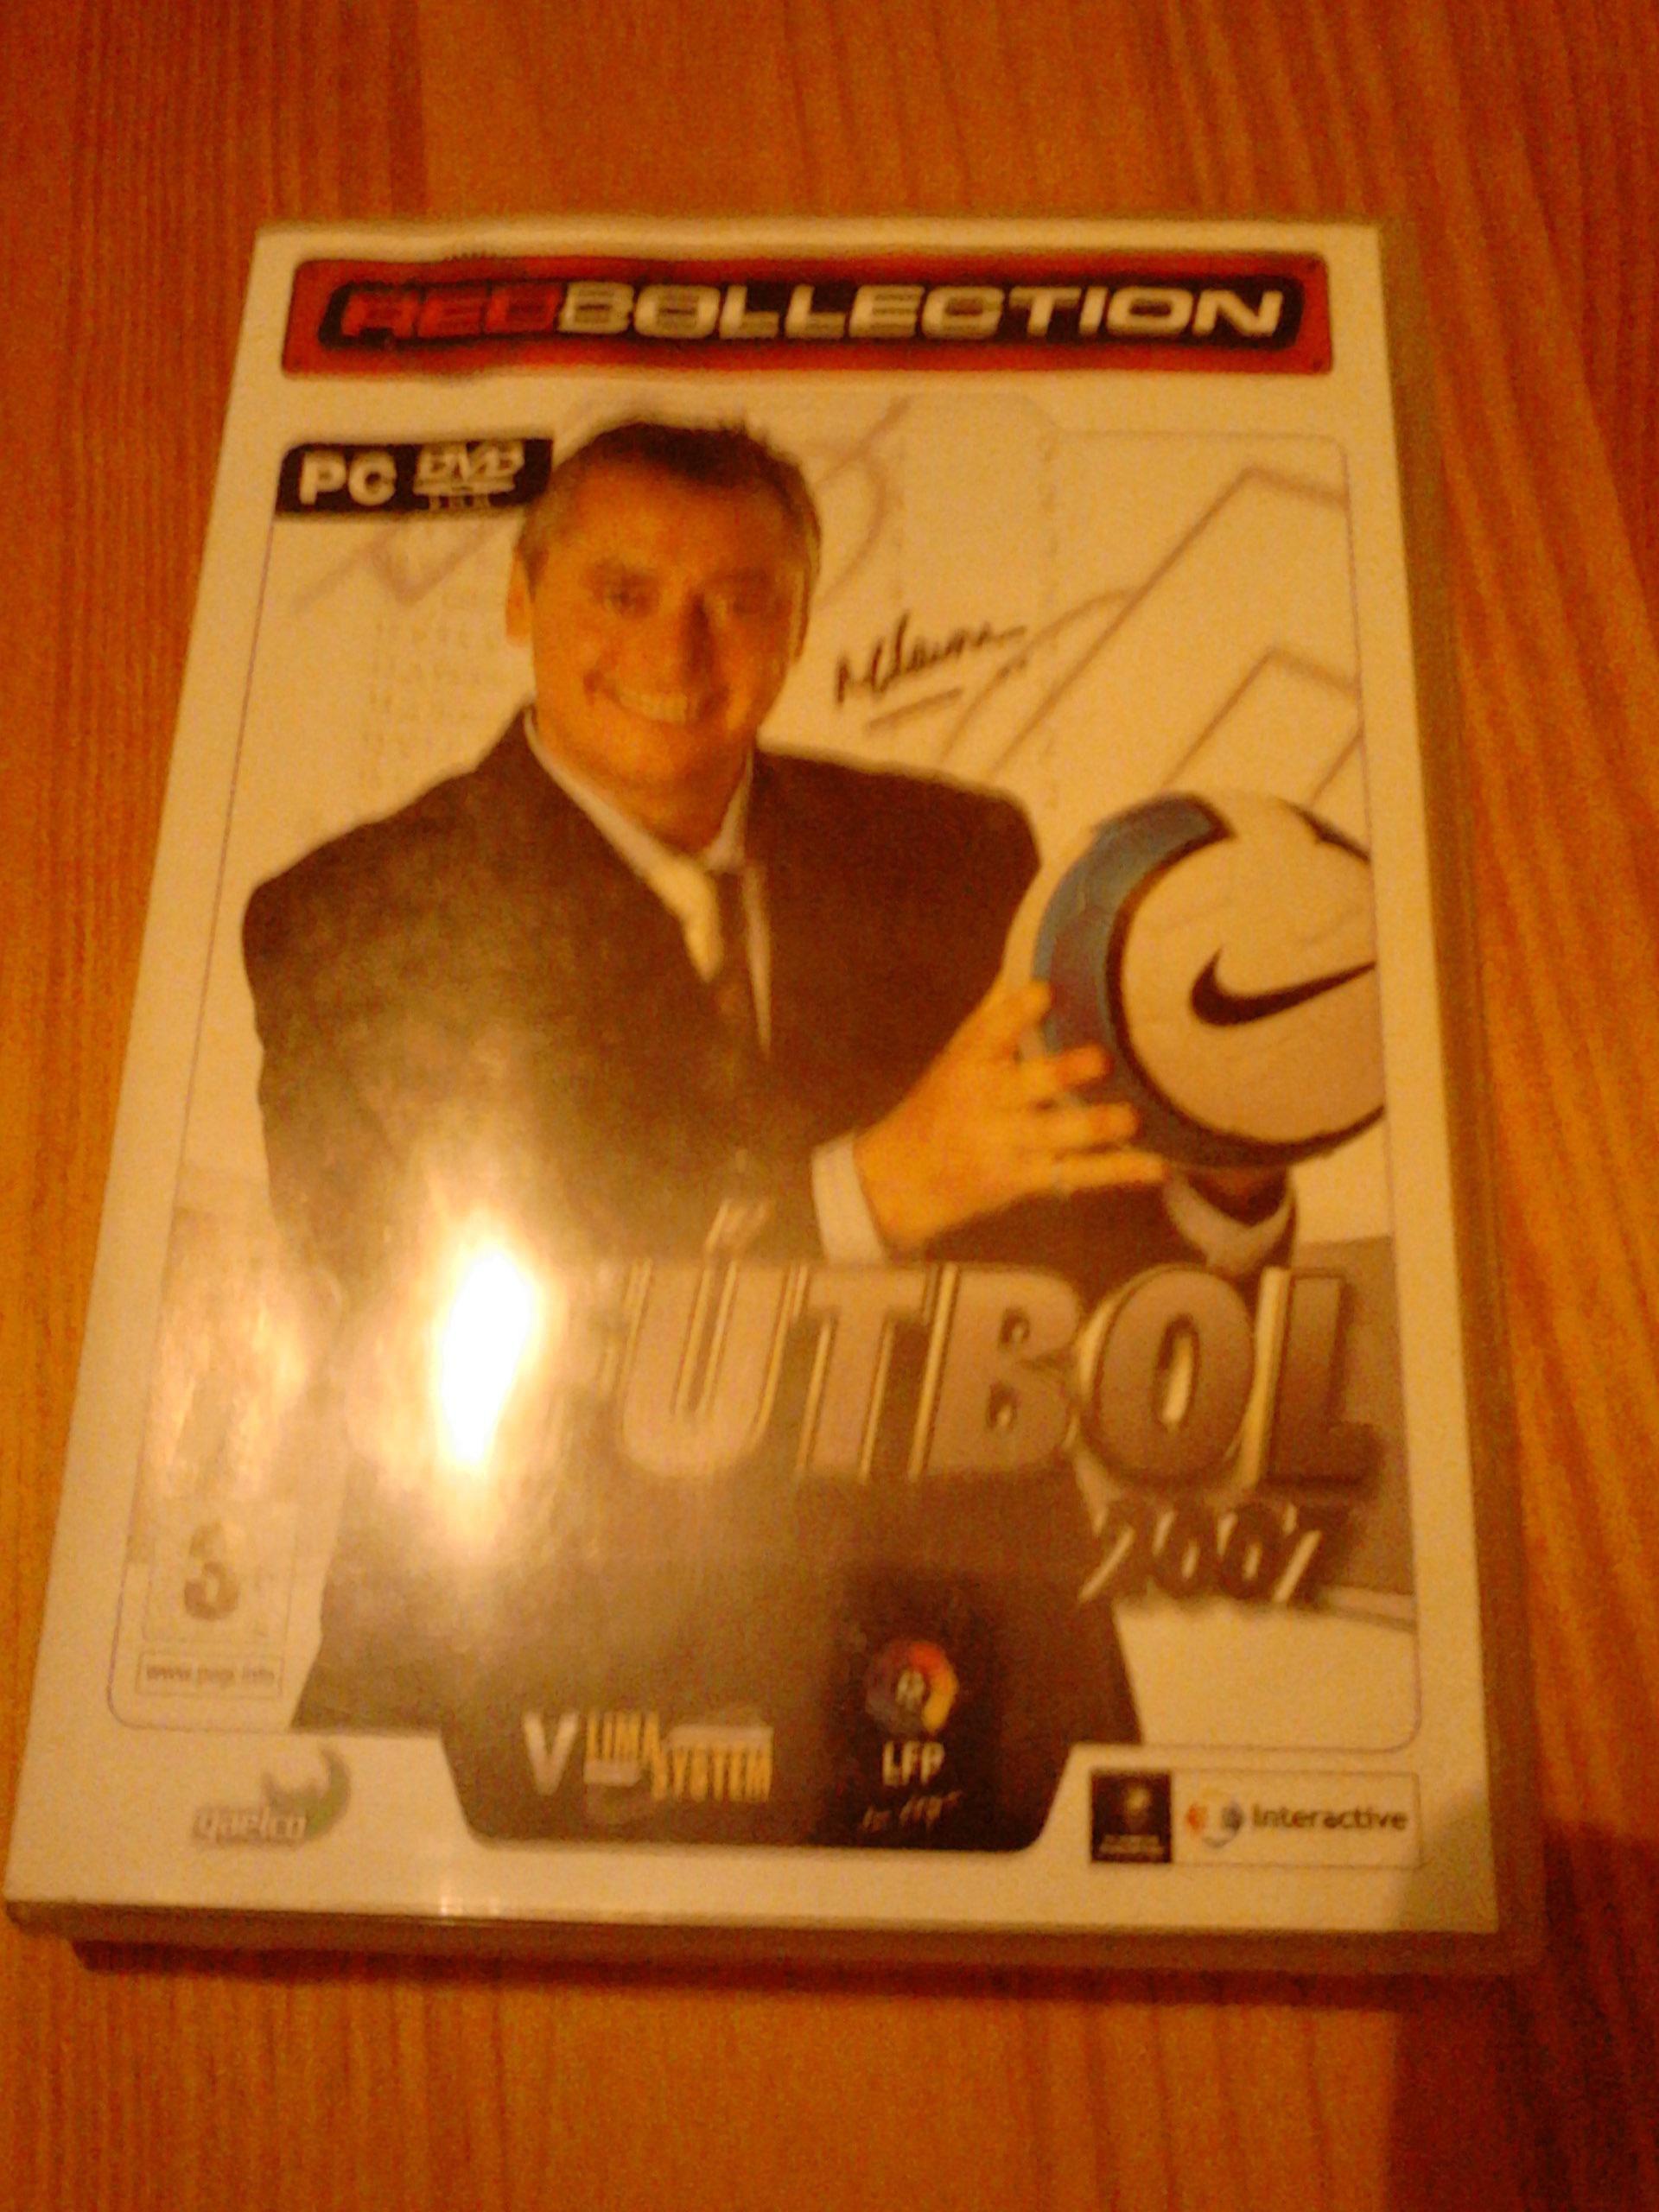 PC Futbol 2007. Requisitos. Sistema operativo   windows 2000 xp. Procesador   Pentium iii 1 9a4e4d272fd63